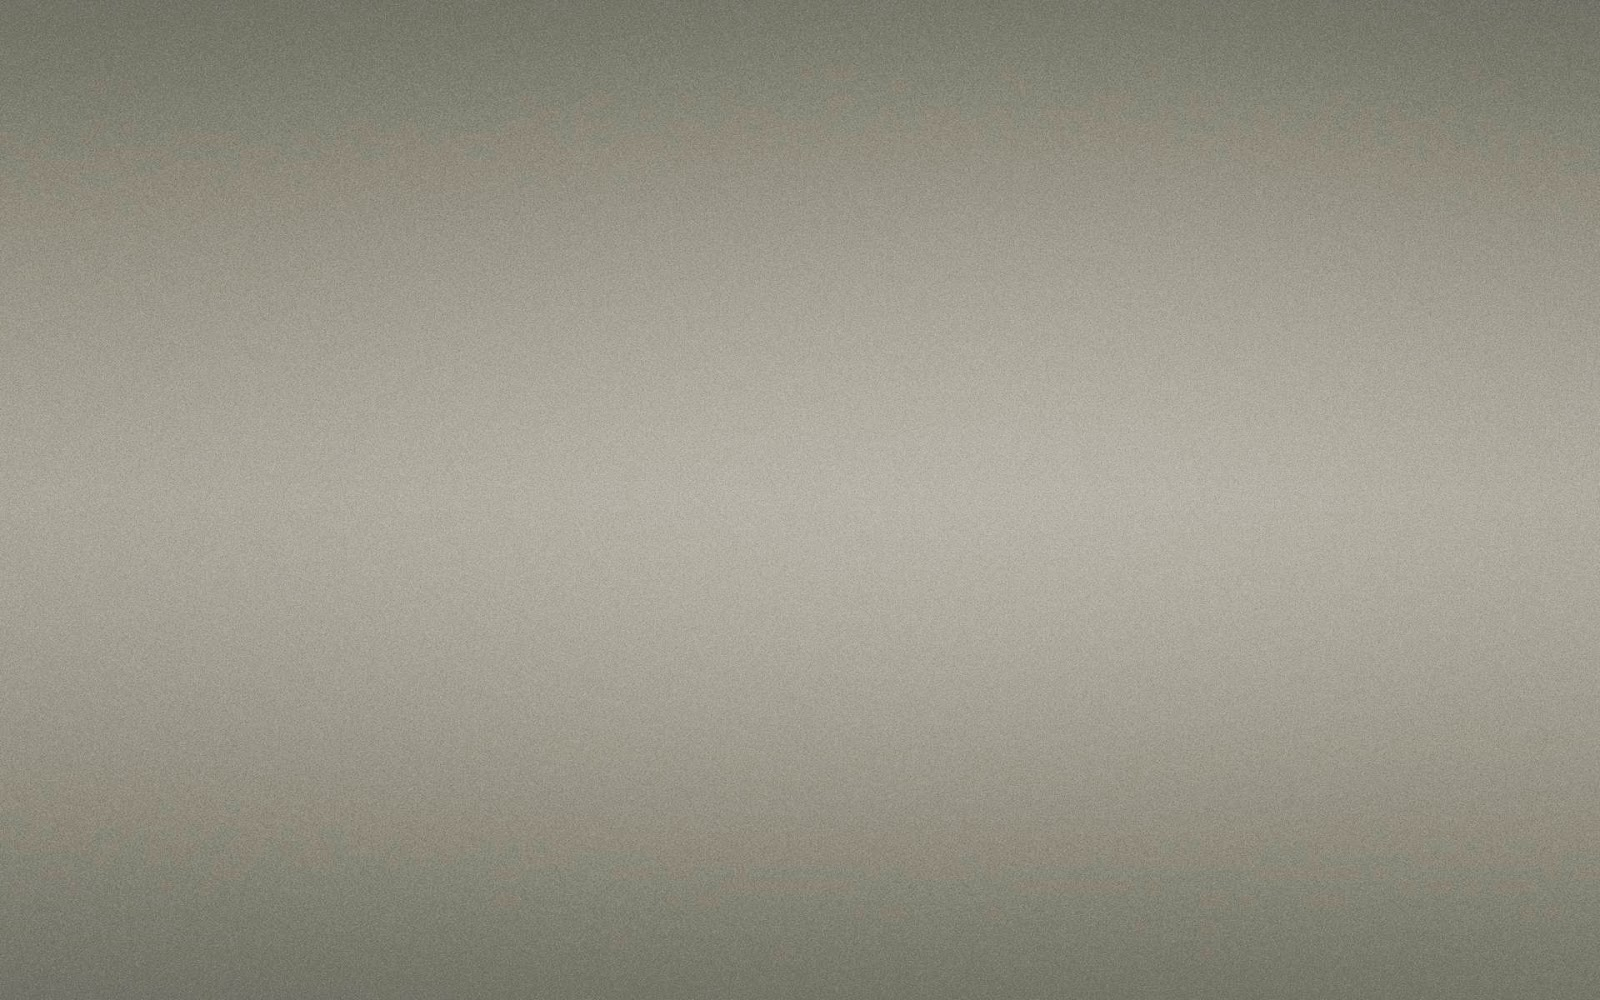 Fondo de pantalla abstracto color gris imagenes for Fondo de pantalla gris